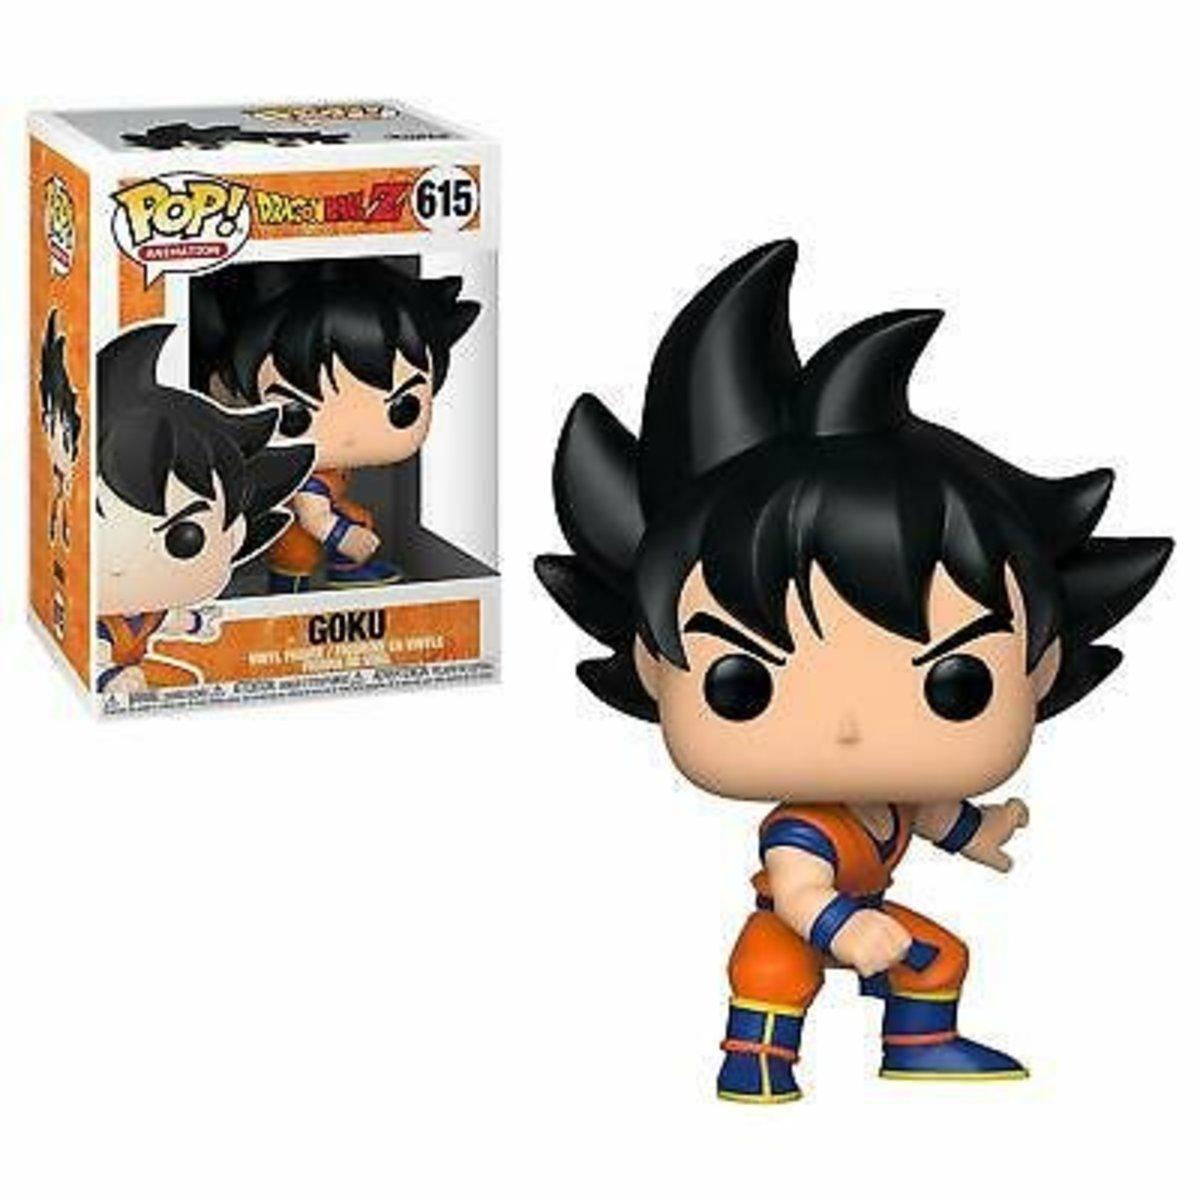 POP 龍珠Z - Goku